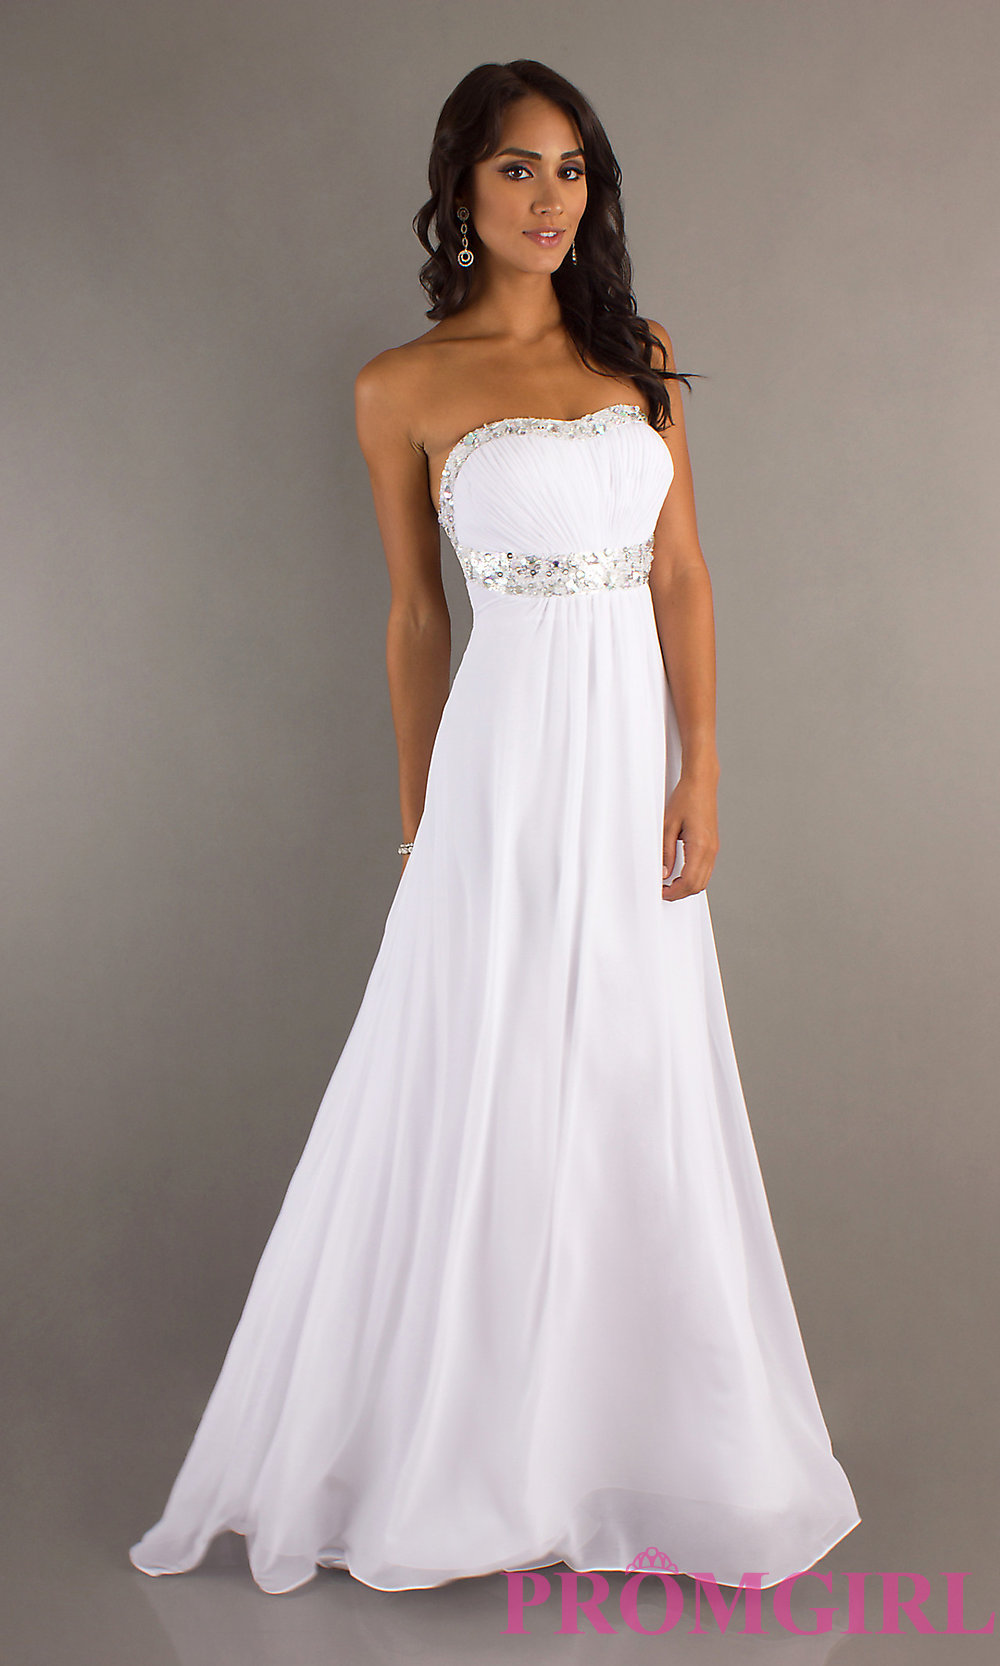 Elegant white gown by la femme 15027